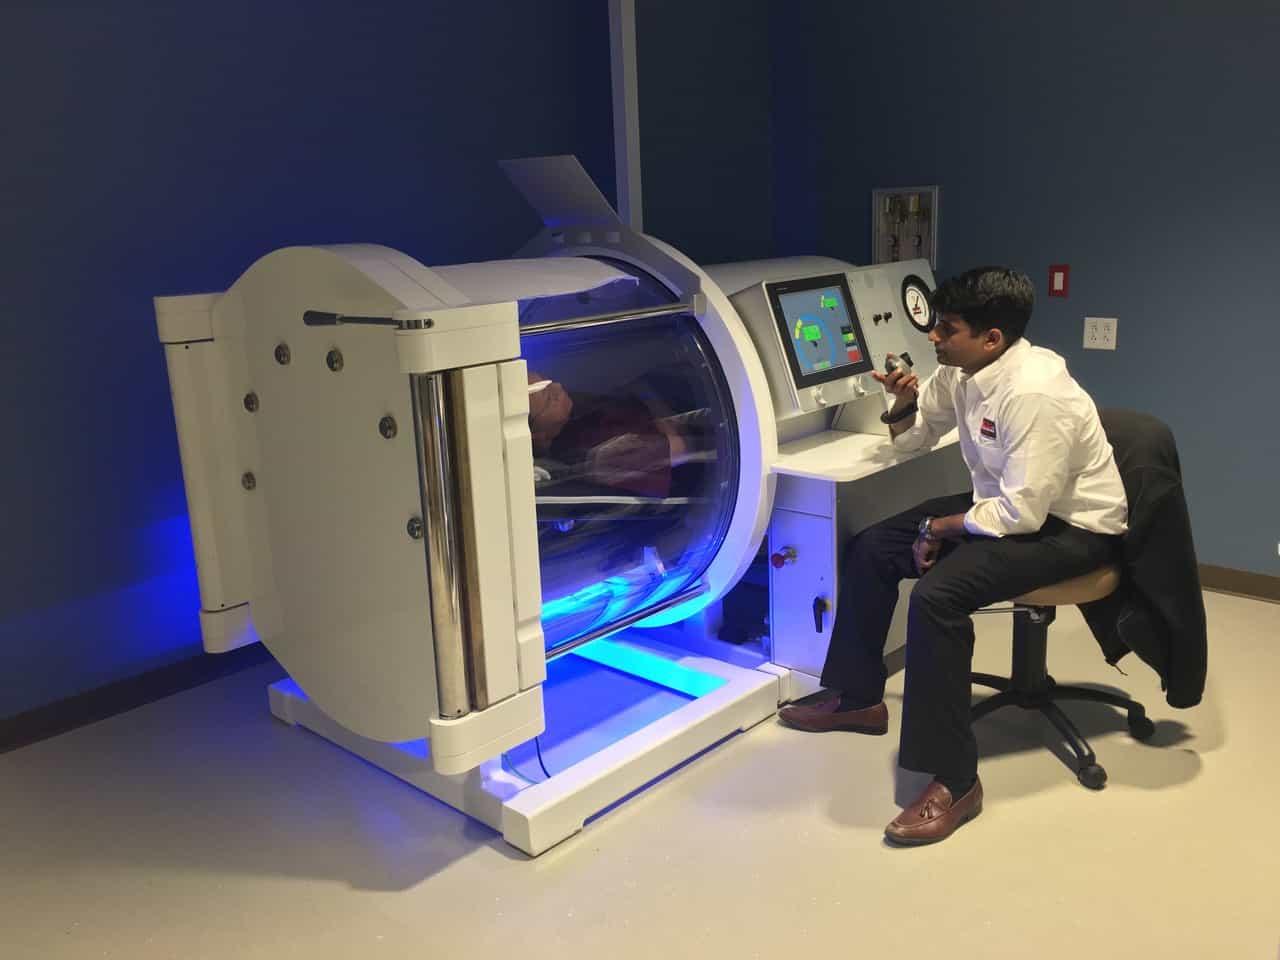 Hybrid 4000 Hyperbaric Chamber by Tekna, MFG